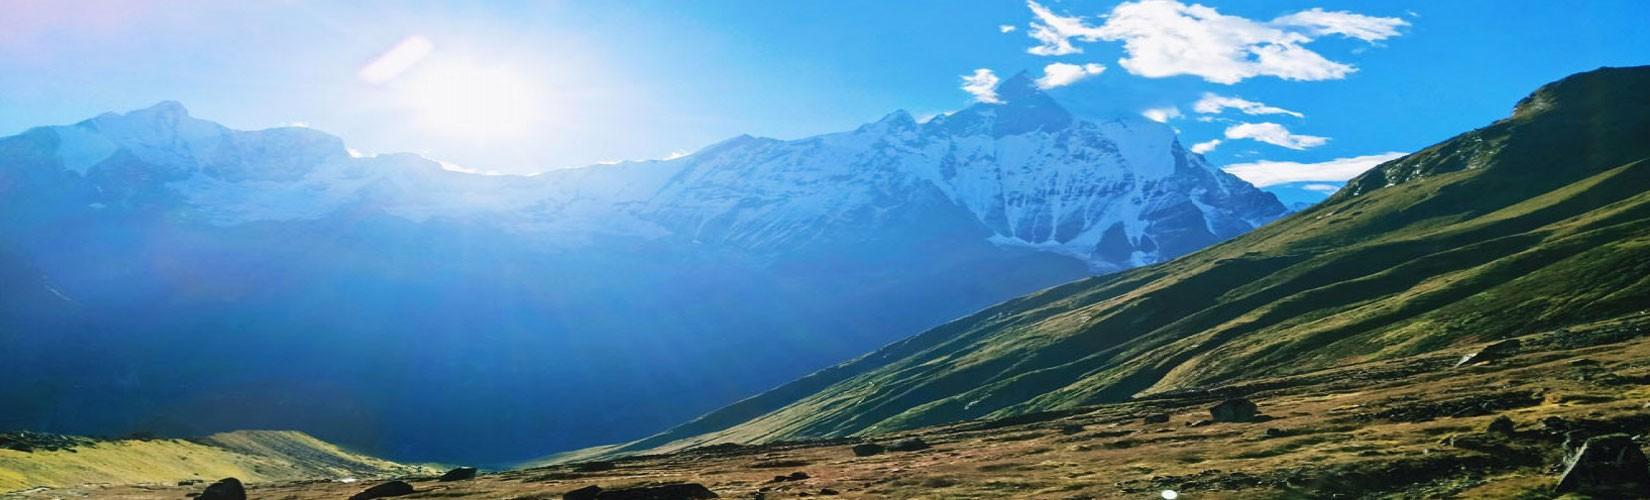 Best Time to Trek Annapurna Base Camp